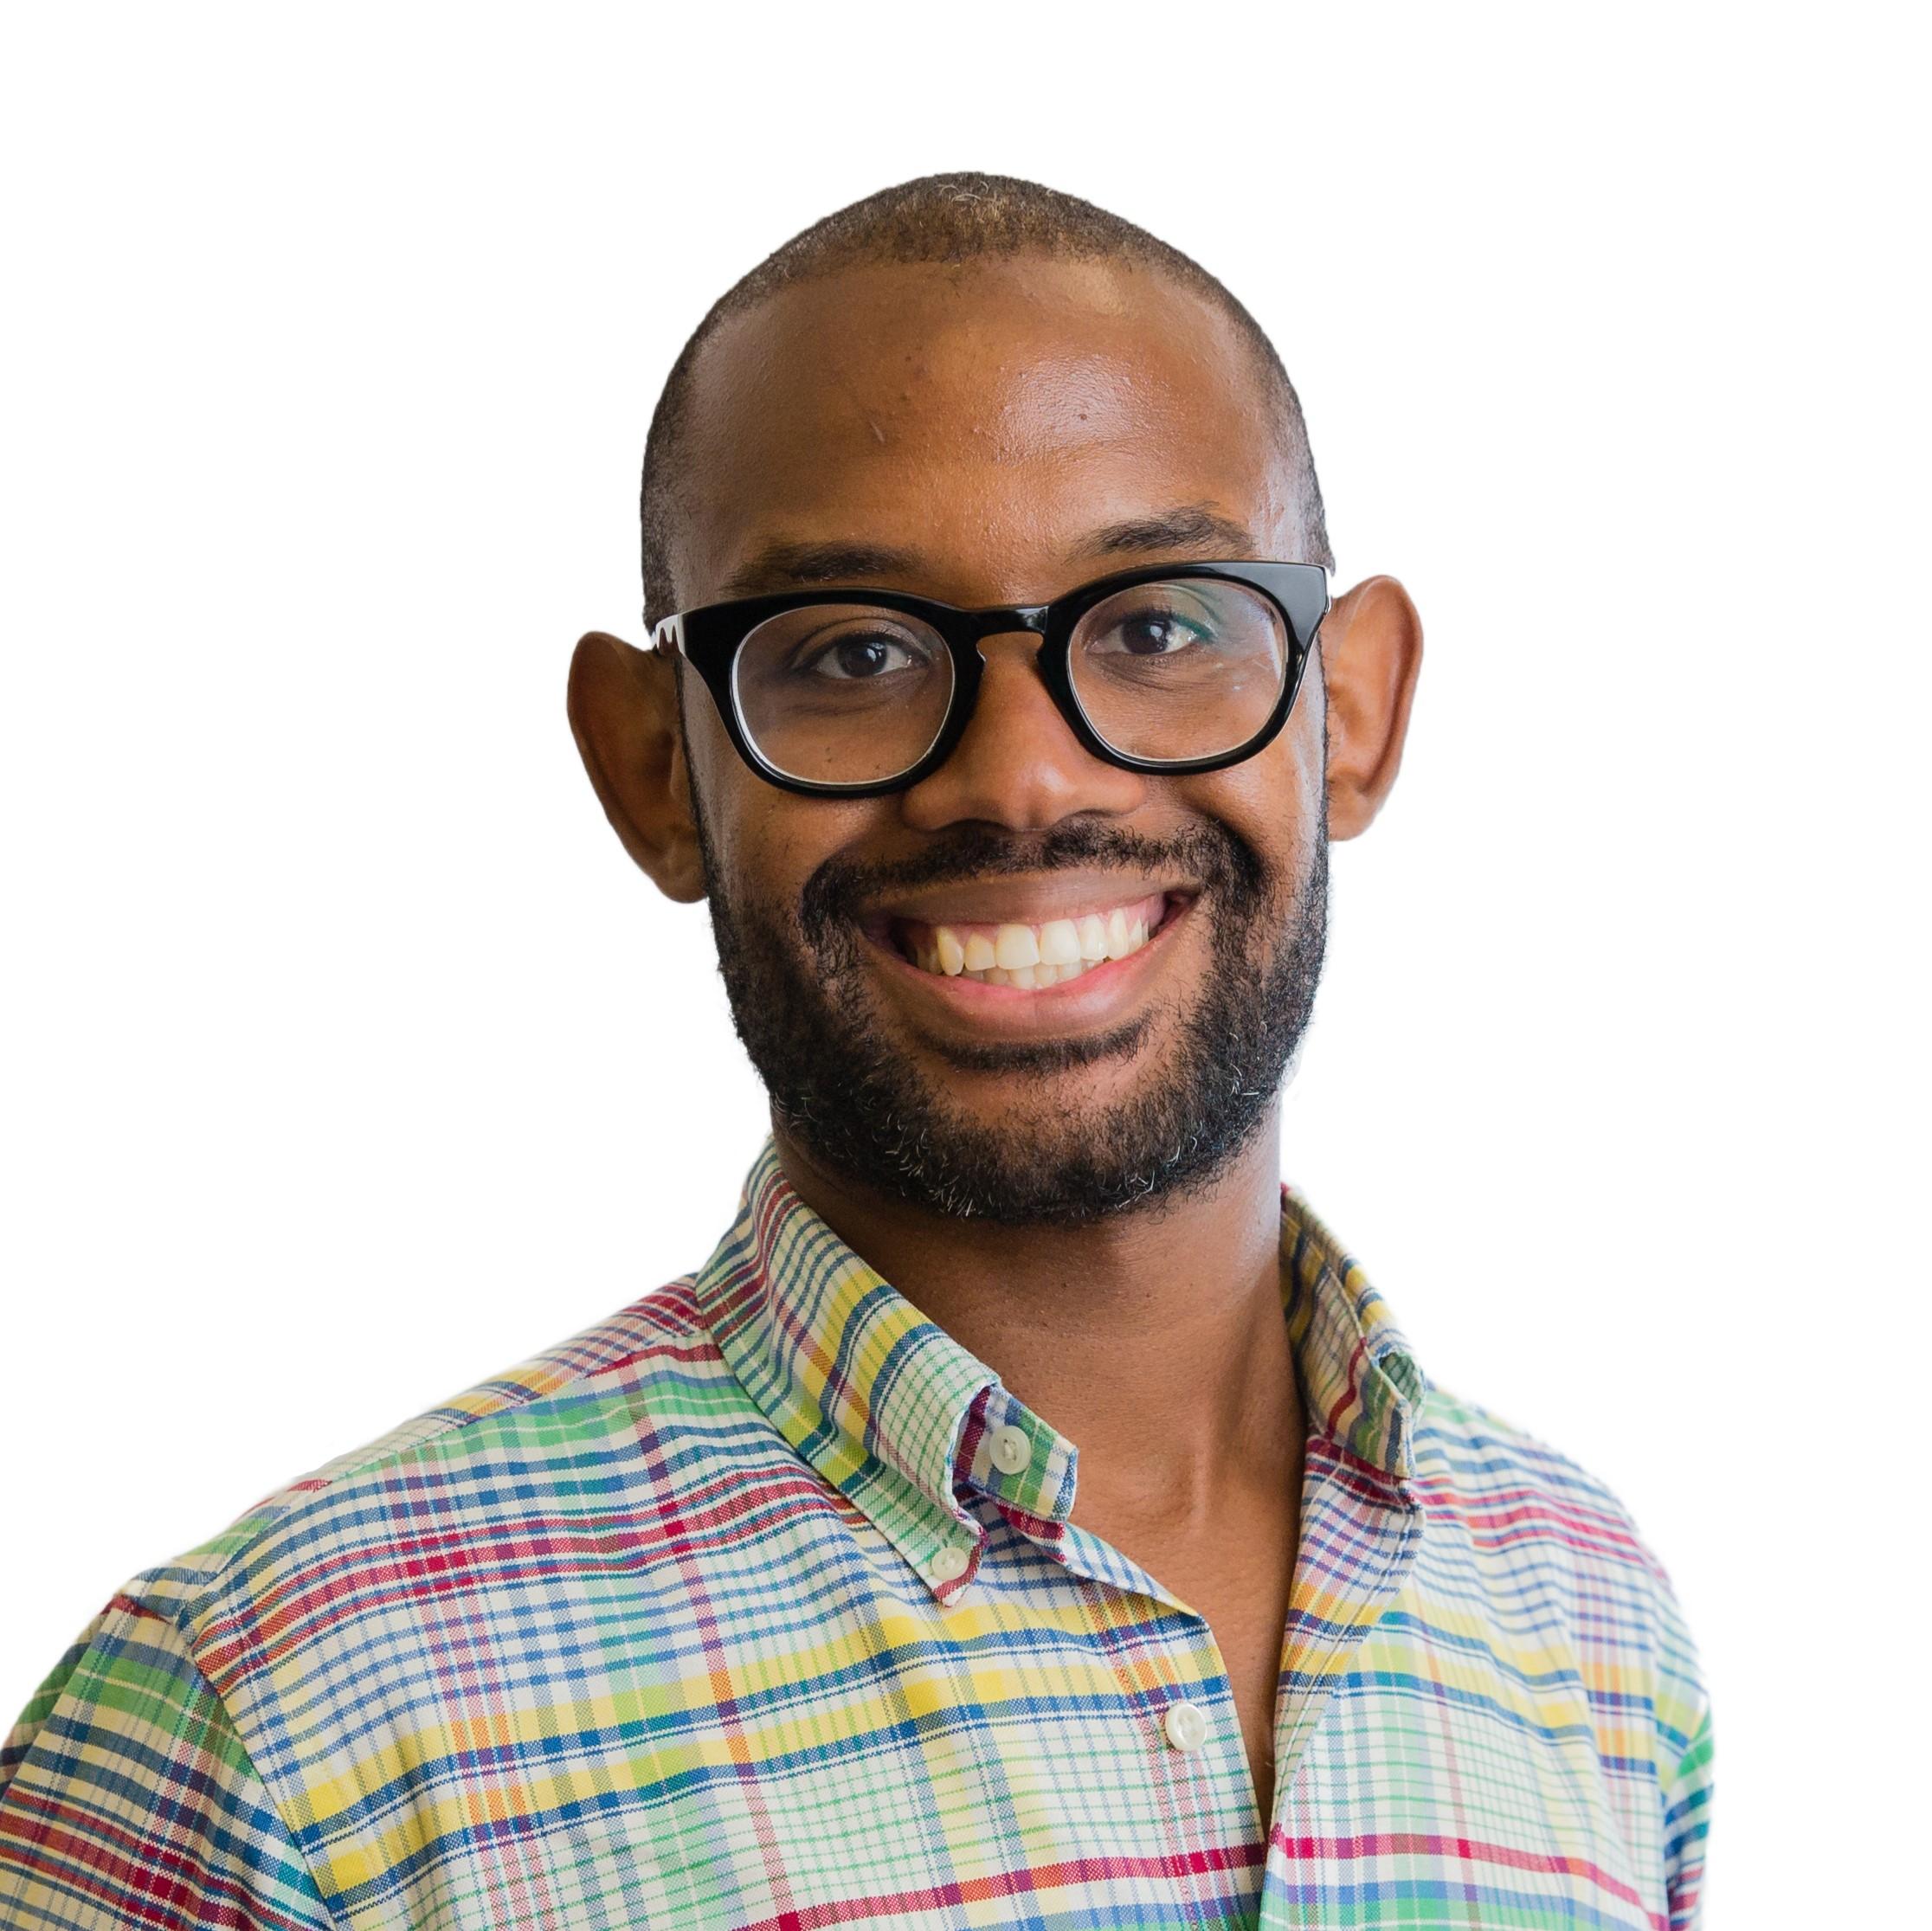 A headshot of Dr. Darren Pierre